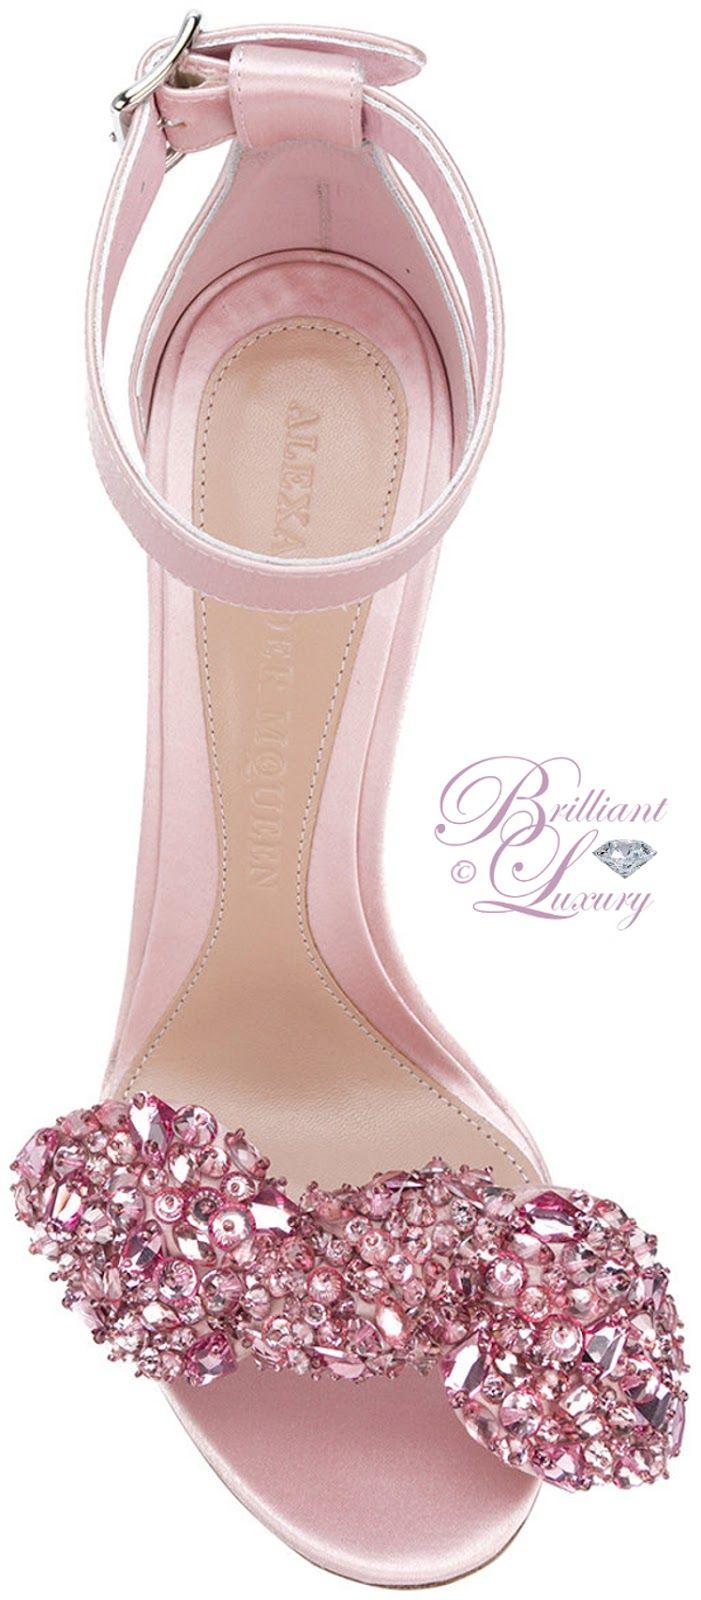 Pantone Fashion Color Pink Lavender S H O E S Pinterest